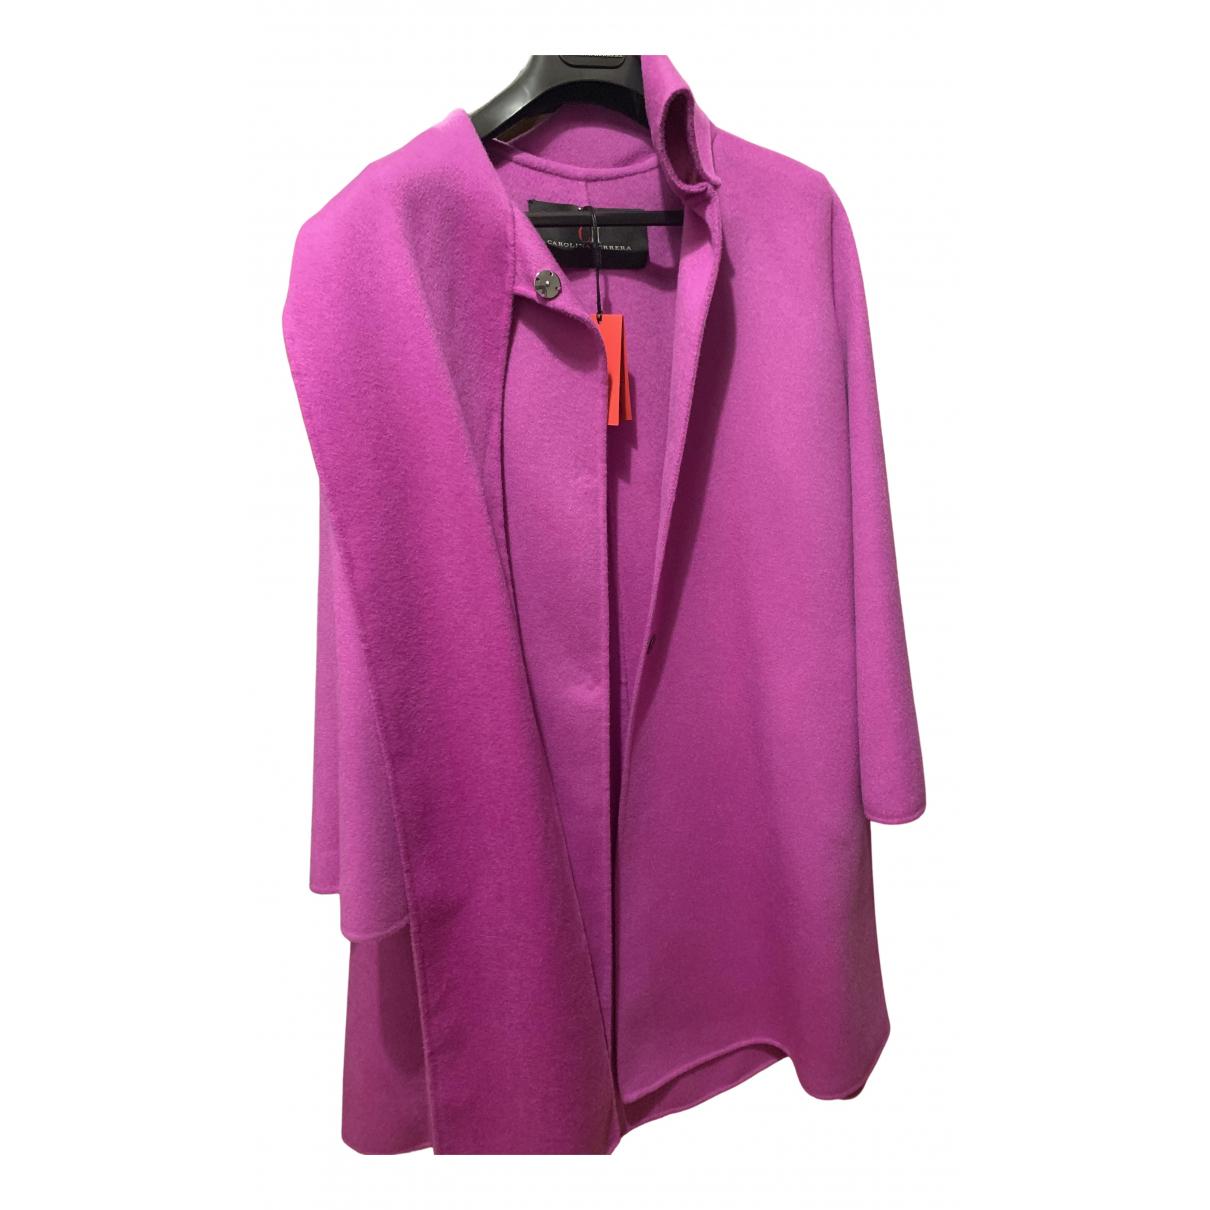 Carolina Herrera - Manteau   pour femme en laine - rose